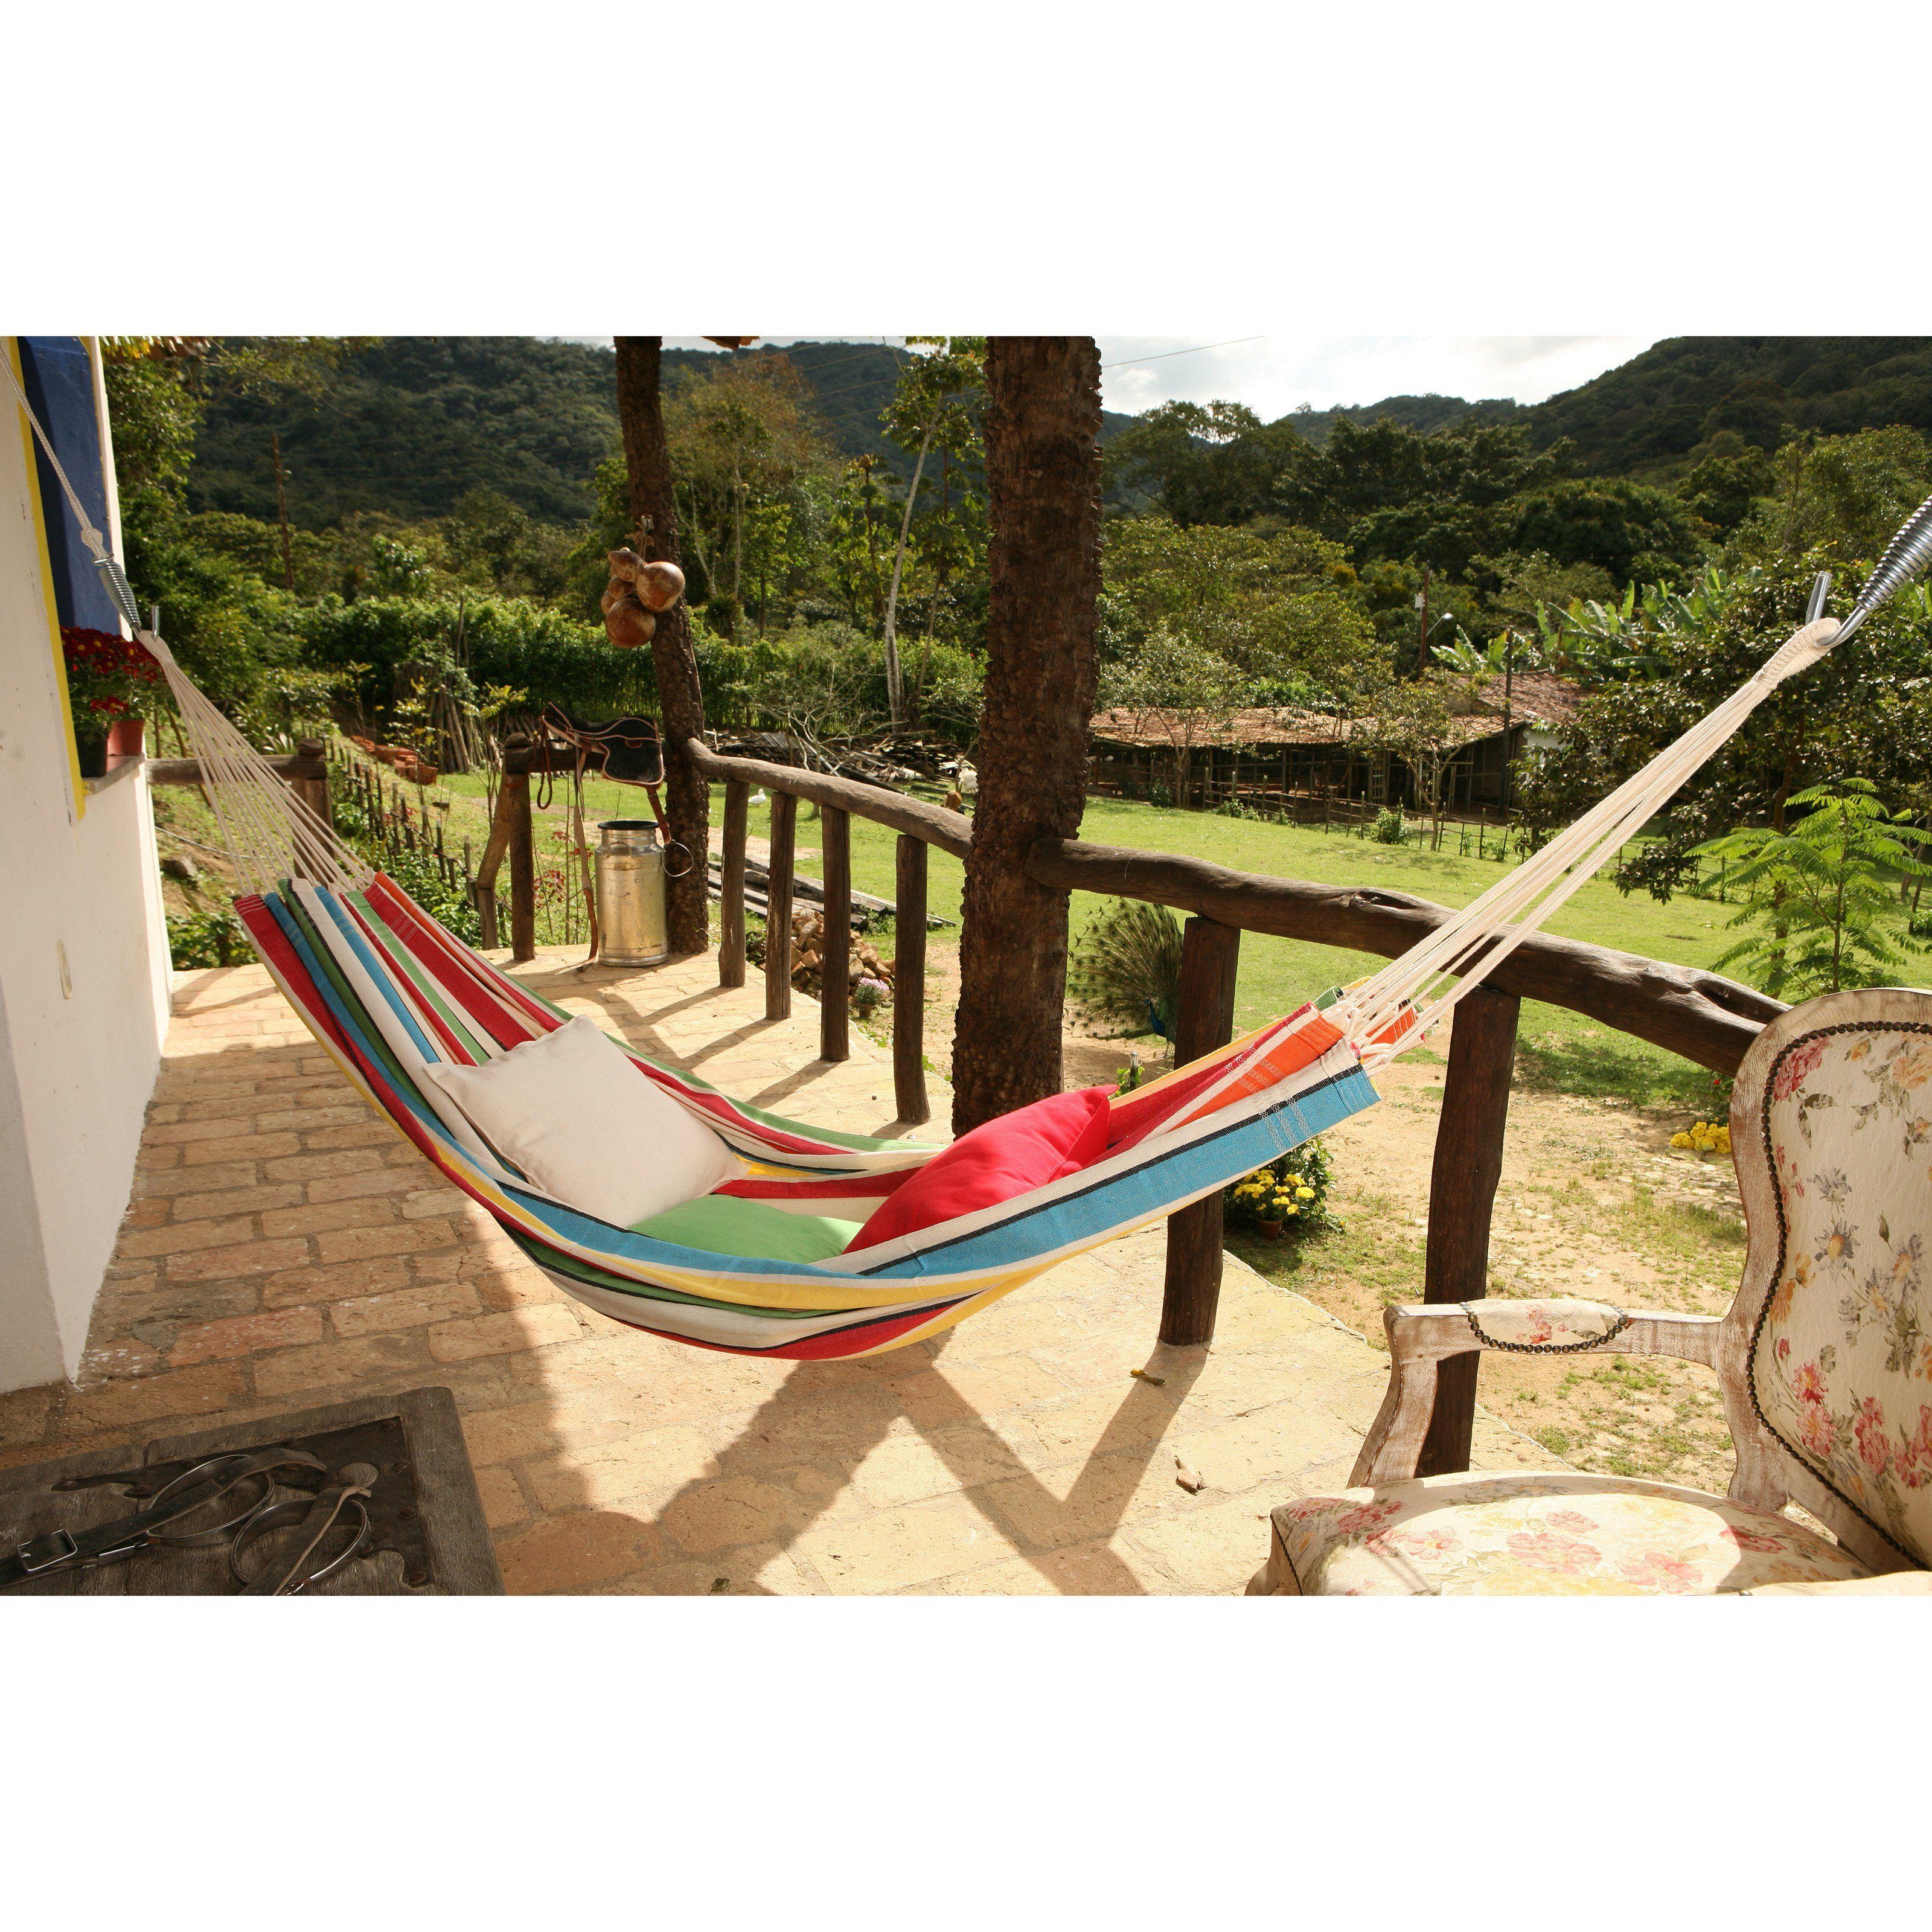 small loewe hammocks in hammock couture pin brown suede lyst sacs bag